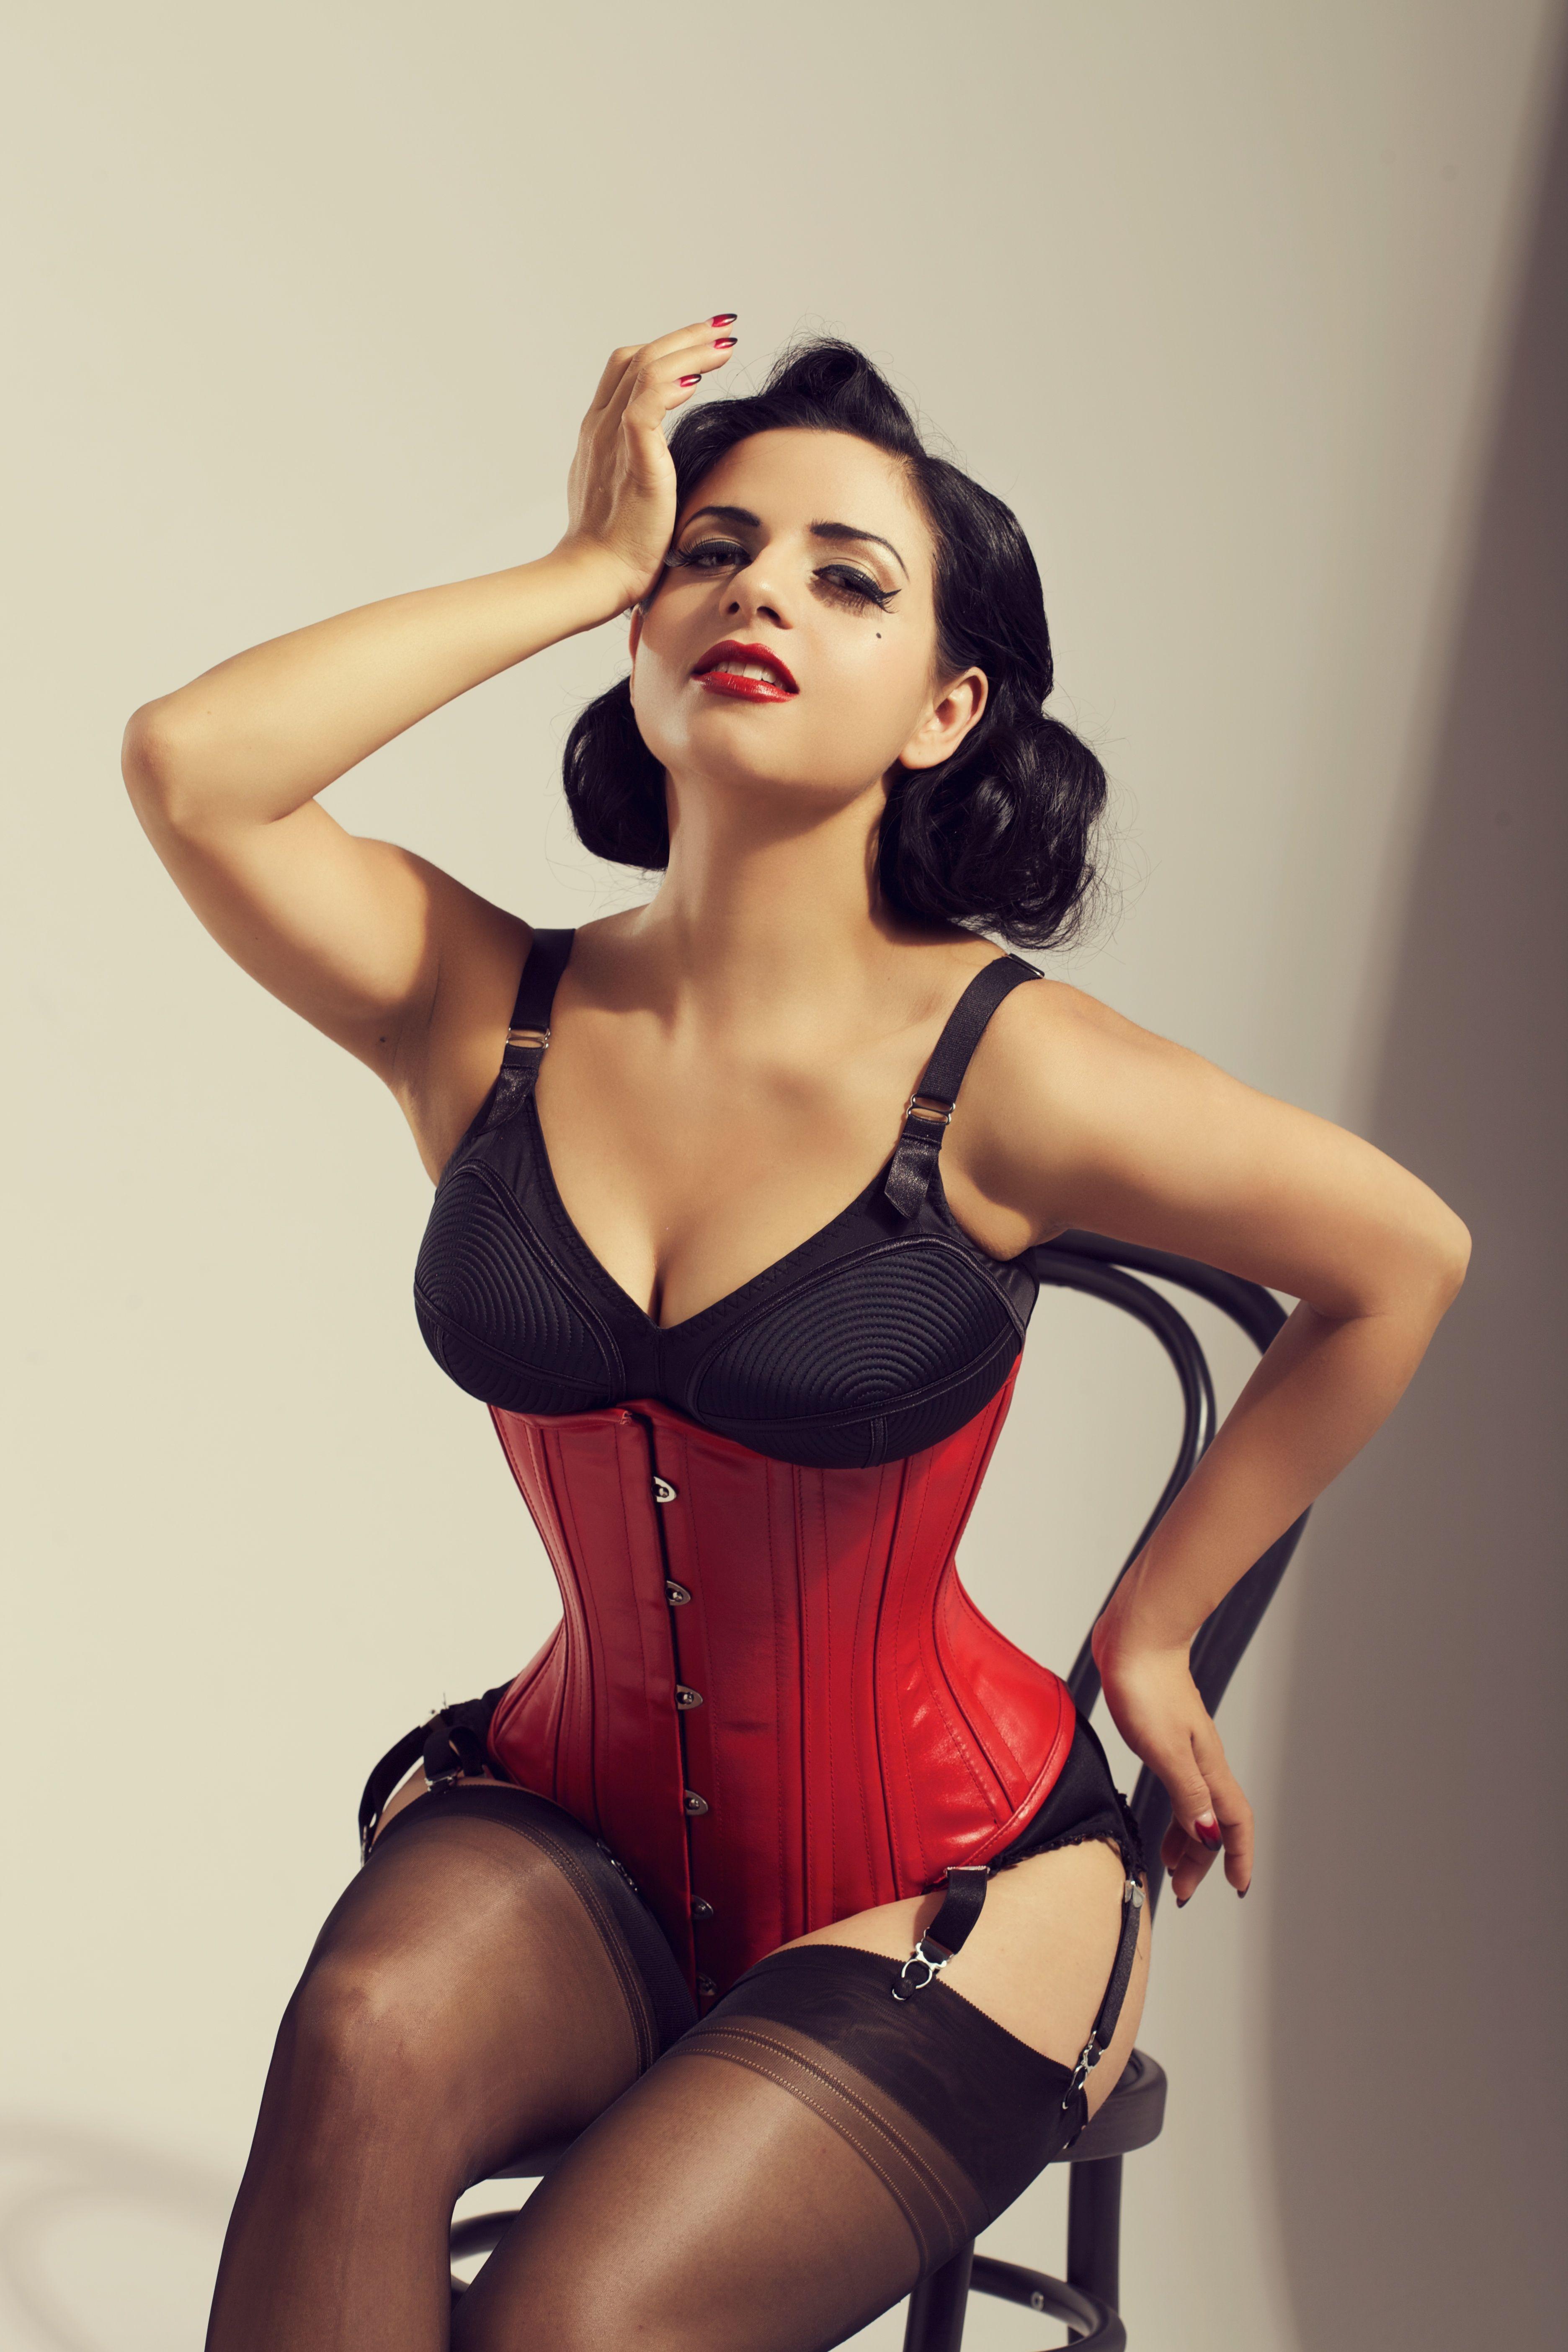 granny korselett 17 best images about Boudoir ~ Retro on Pinterest | Lingerie photos, Models  and Vintage lingerie